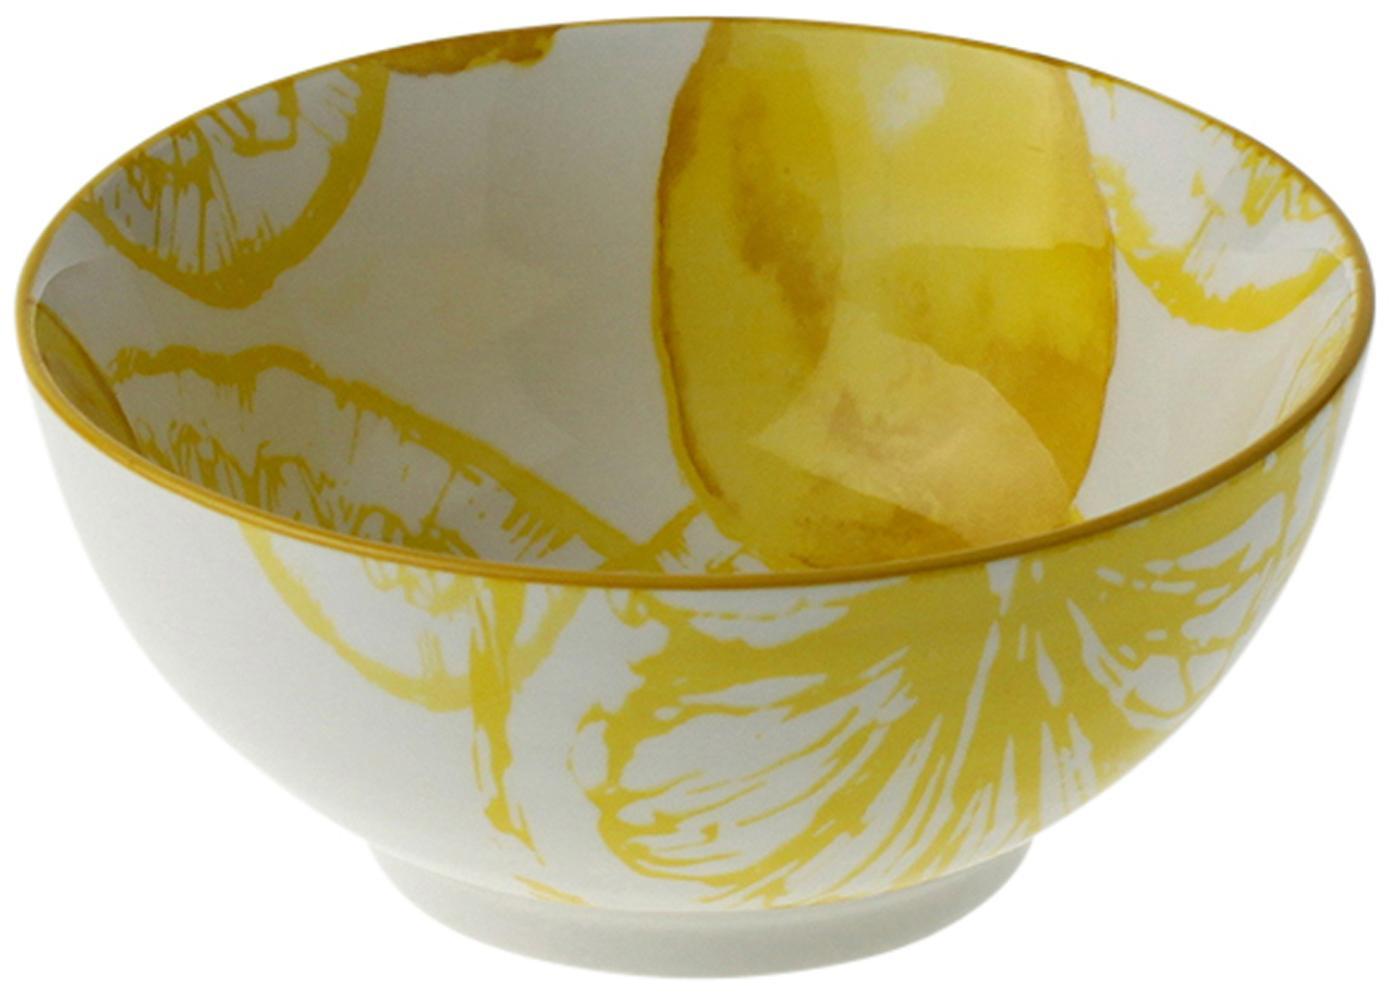 Ciotola con motivo a limone Lemon, Porcellana, Bianco, giallo, Ø 14 x Alt. 7 cm